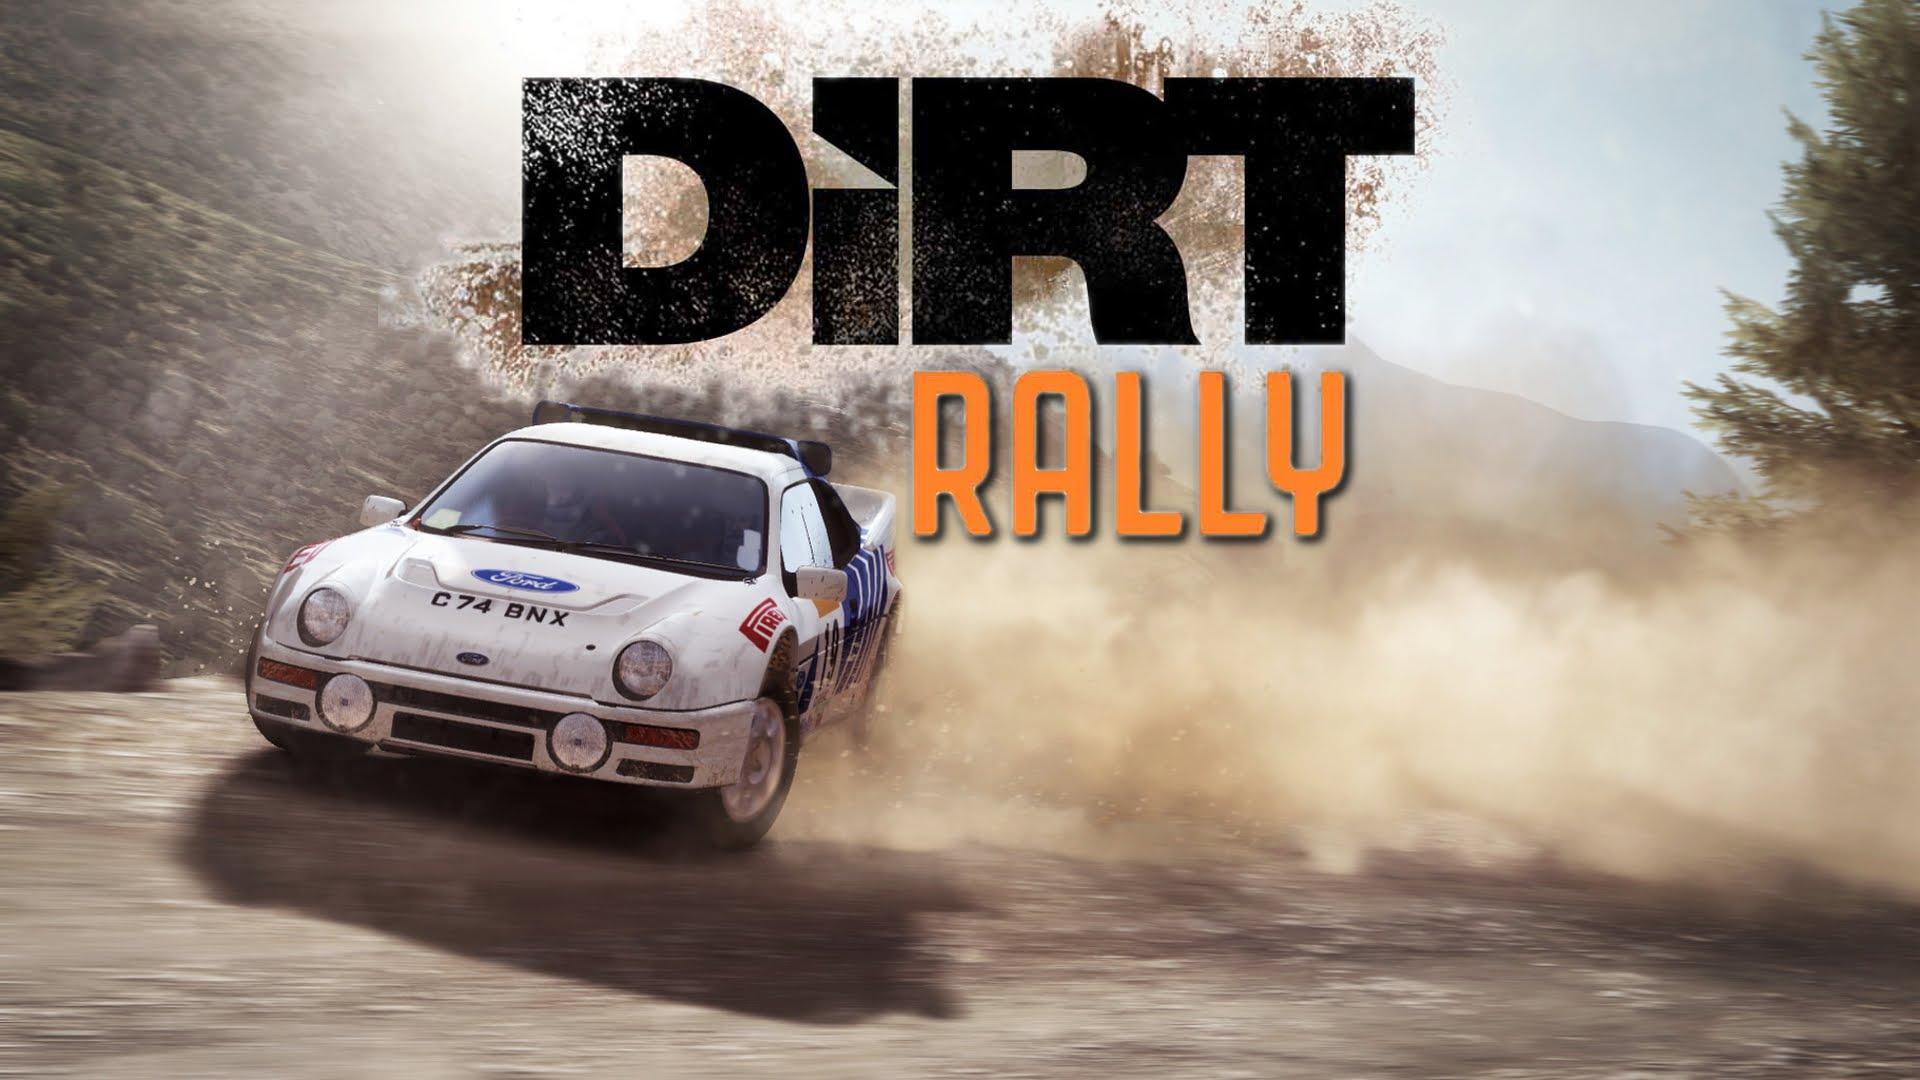 DiRT Rally widescreen wallpapers